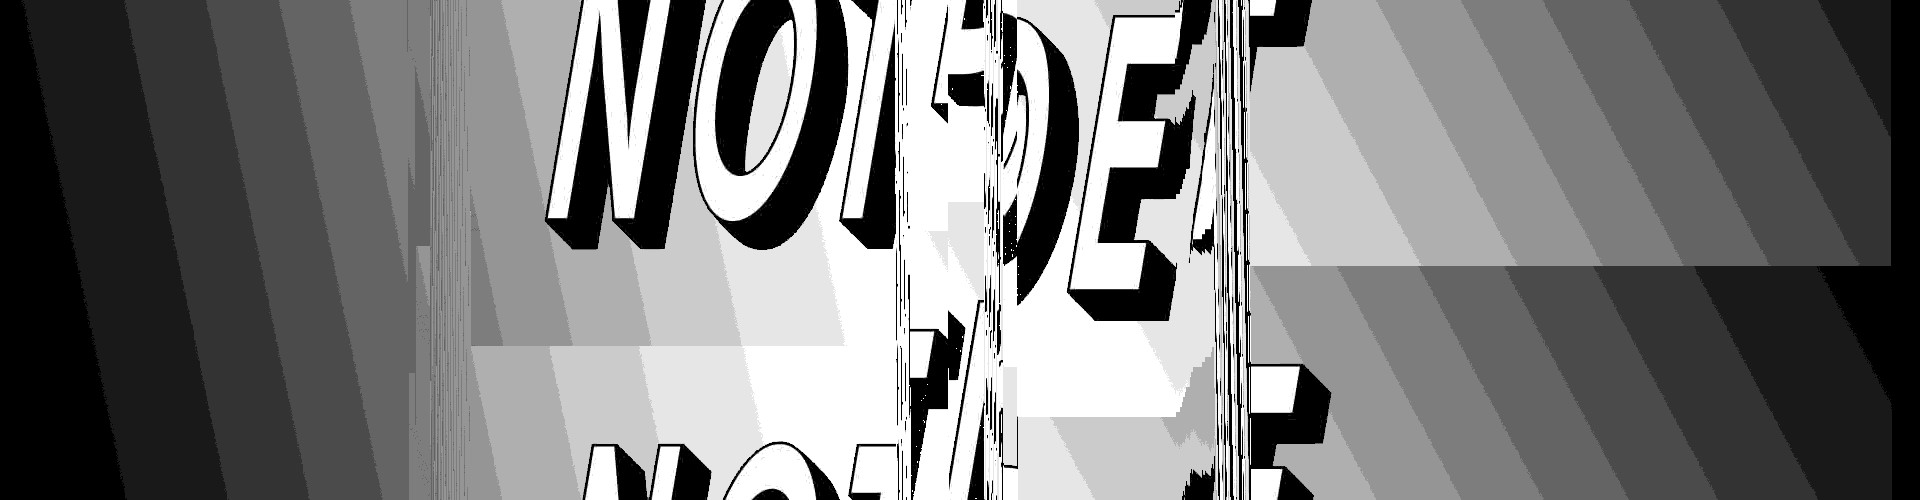 NOTDEF